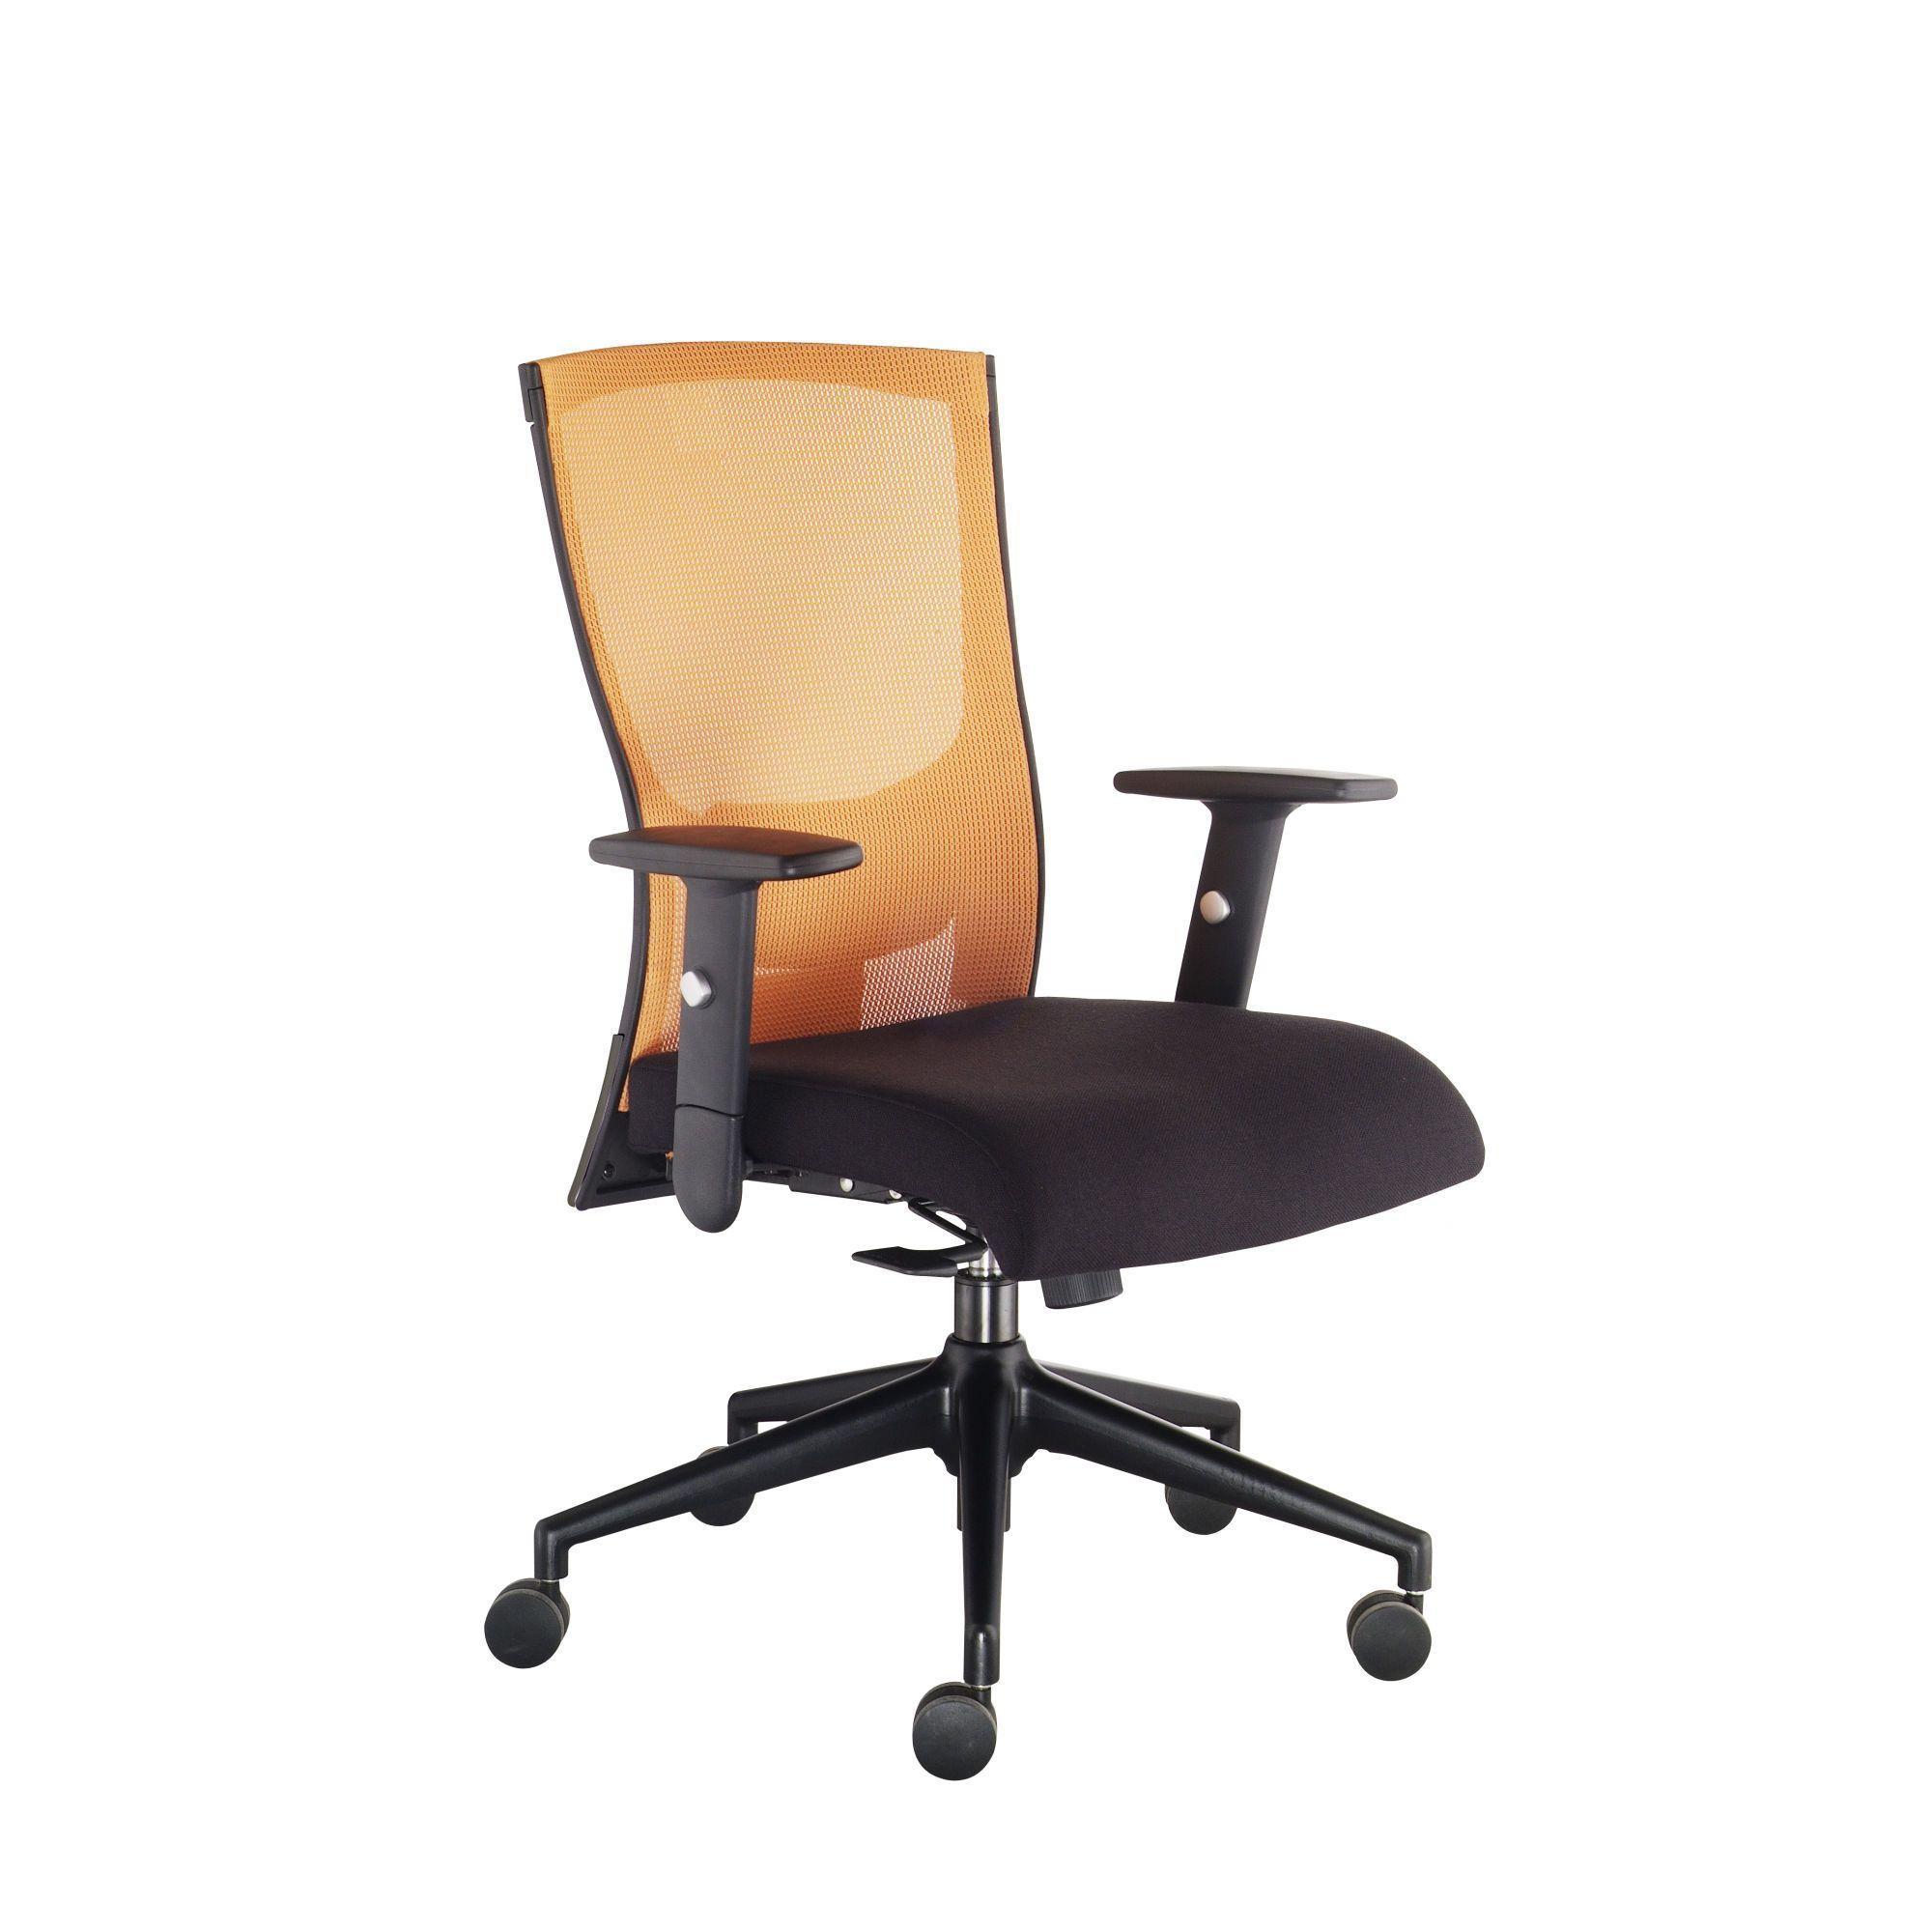 The Ergo Office Mid Back Mesh Task Chair